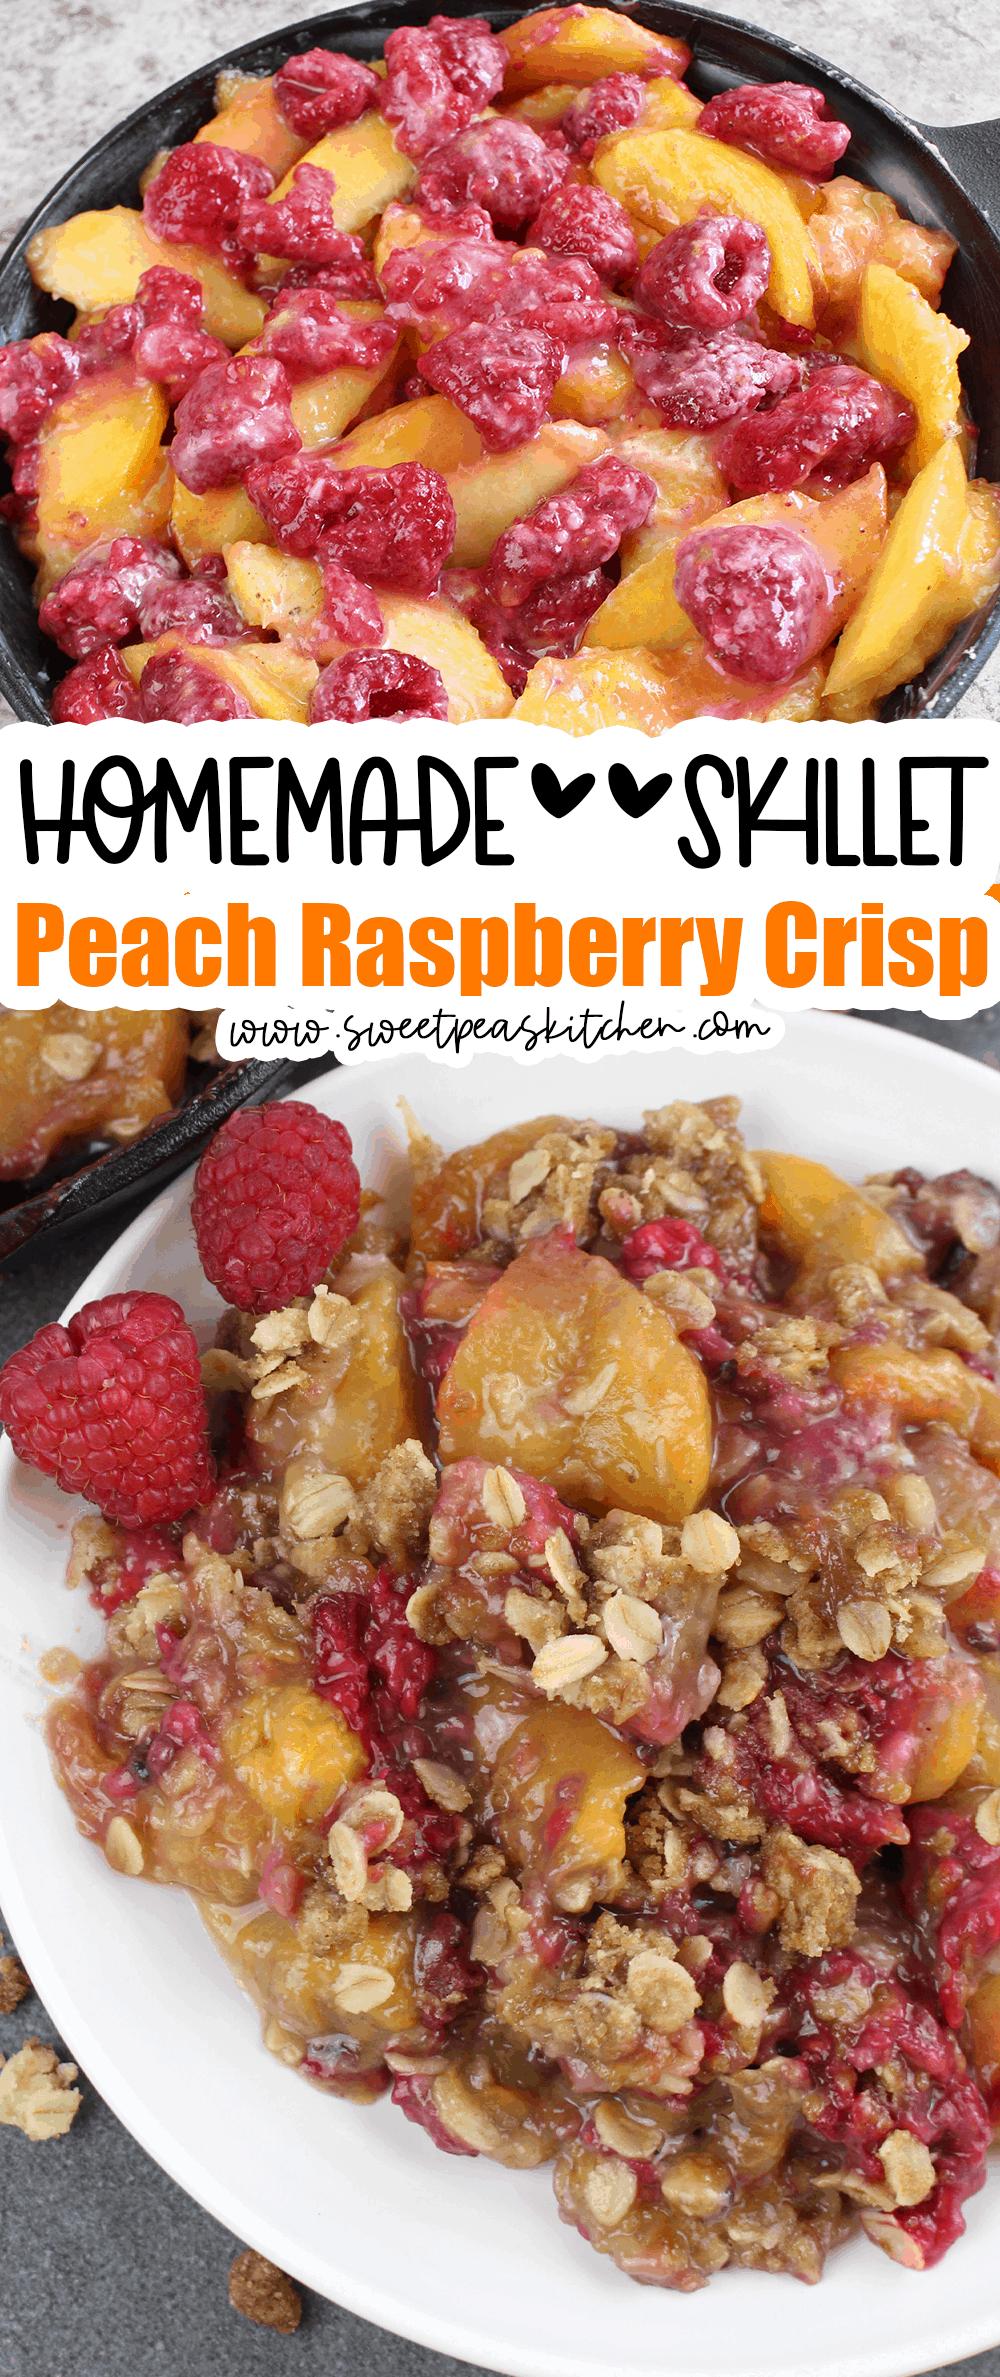 Skillet Peach Raspberry Crisp